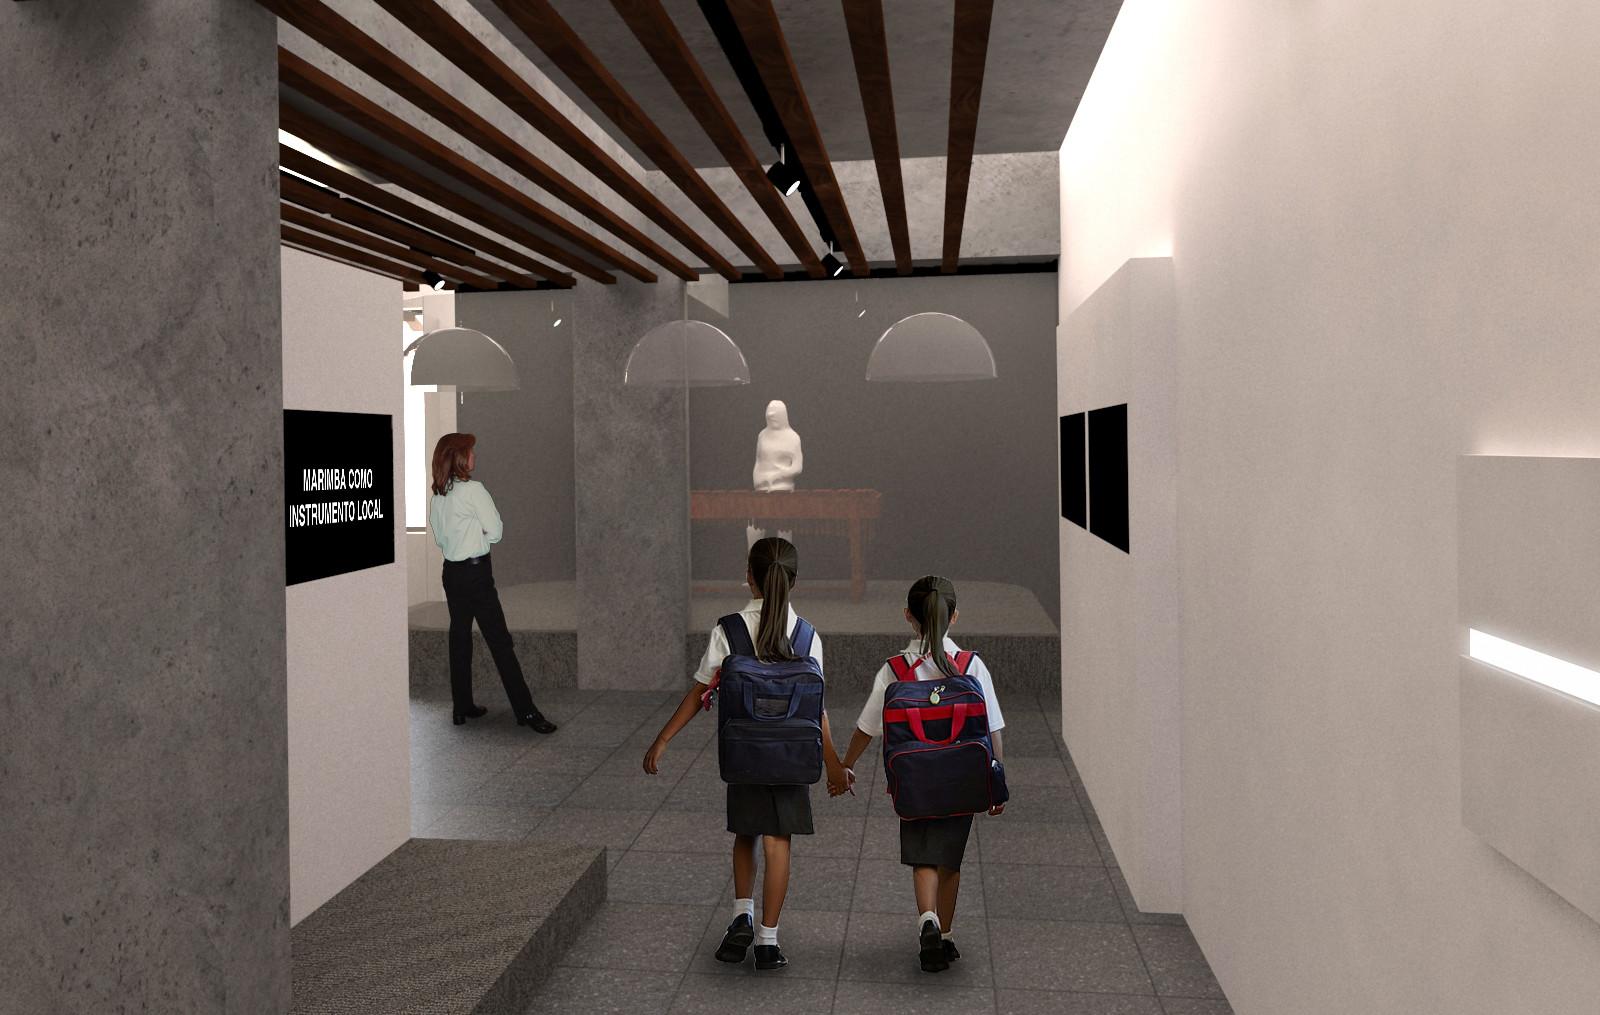 Instituto de la Marimba